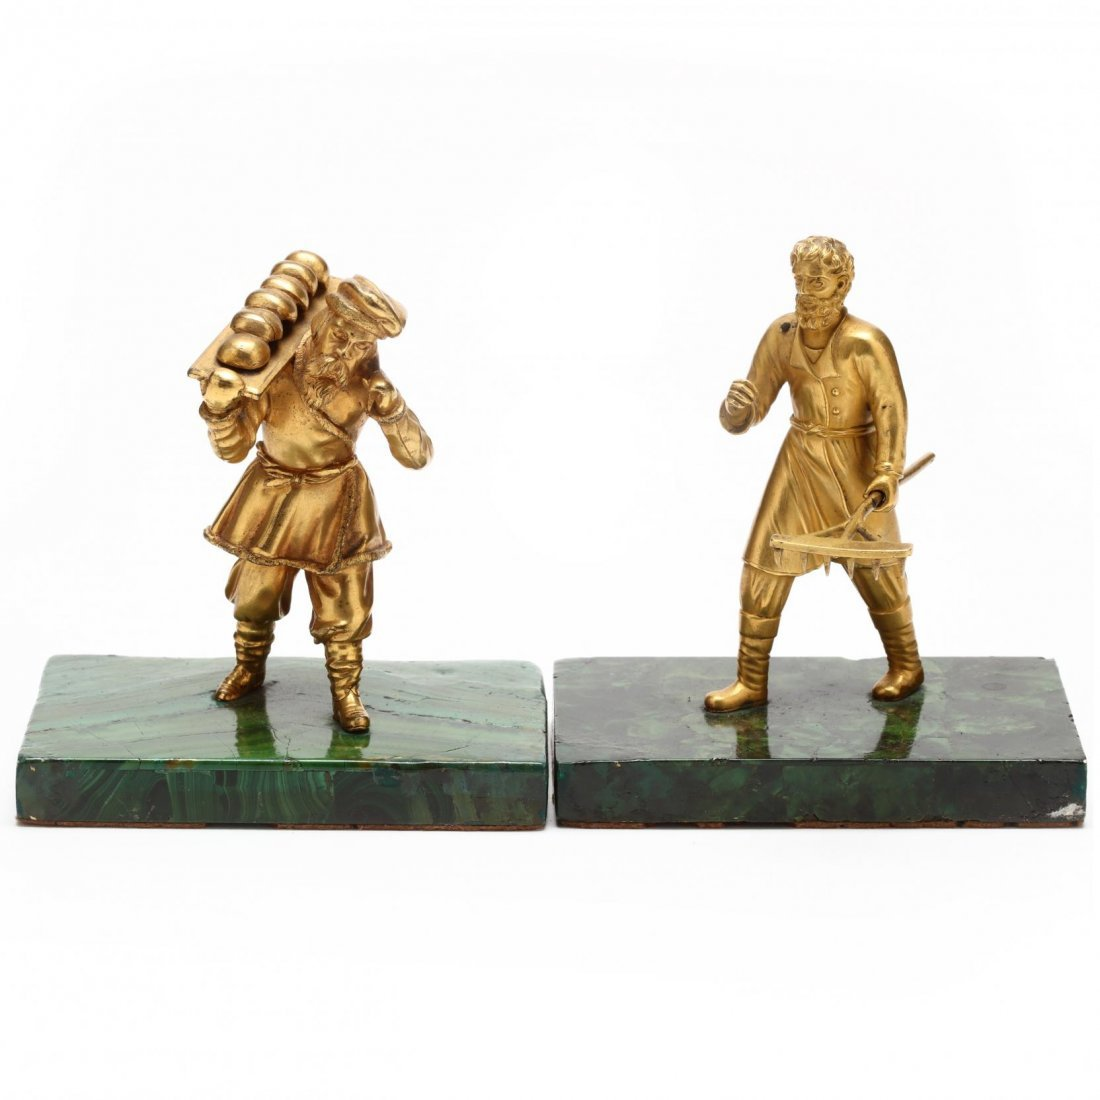 Group of Three Antique Russian Gilt Bronze Figures - 4